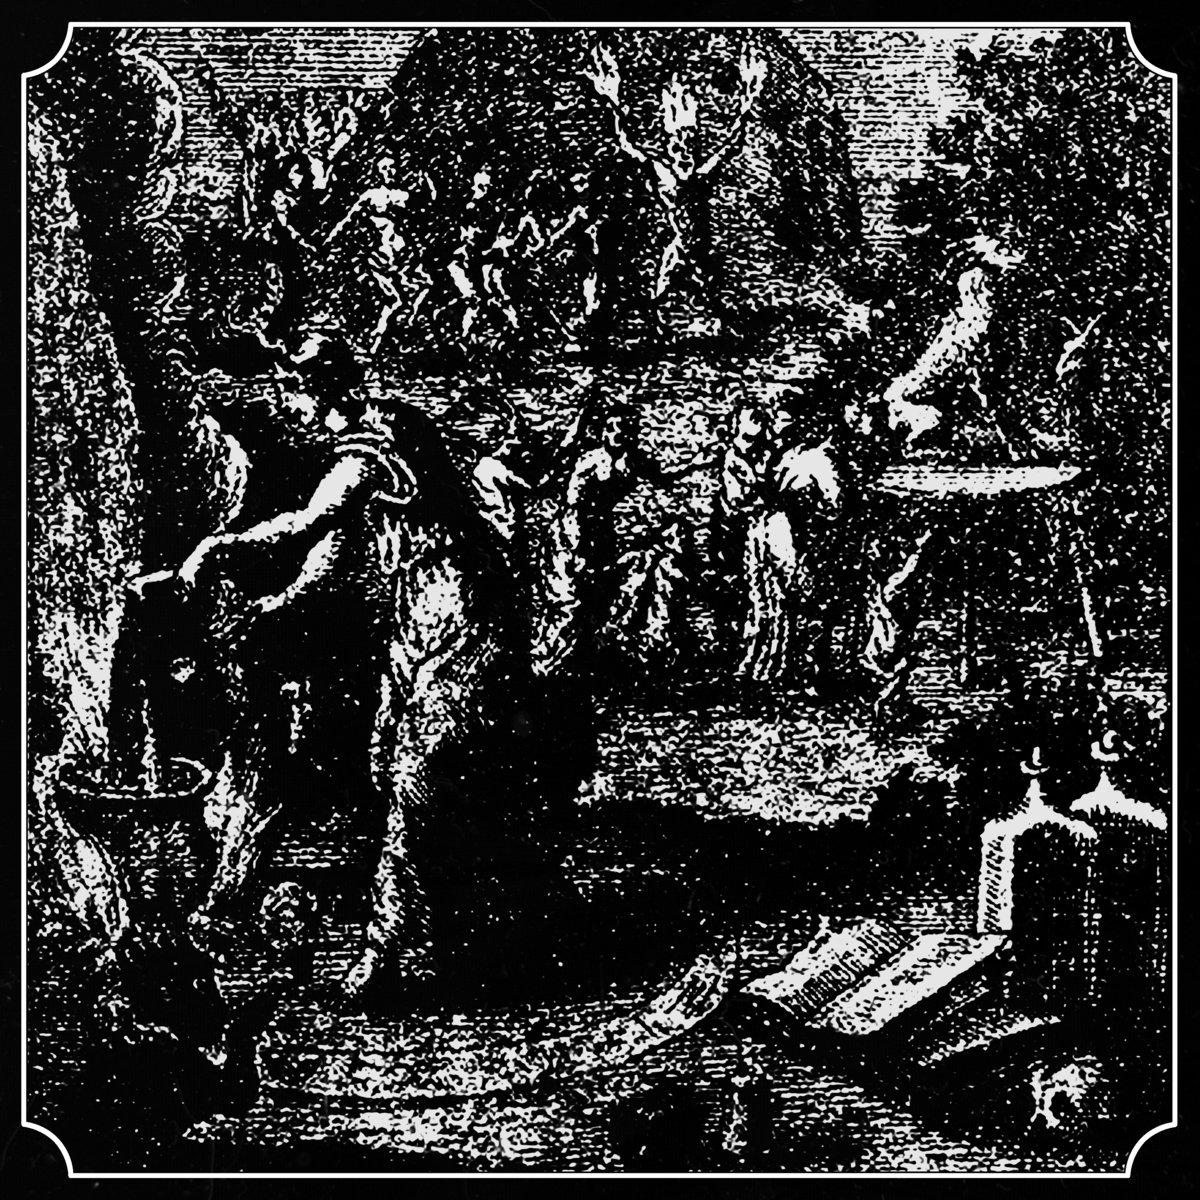 Mäjestätens Dunkla Håg, I Dödens Profana Ståt (Full-lenght) | Digerdöden |  Mysticism Productions